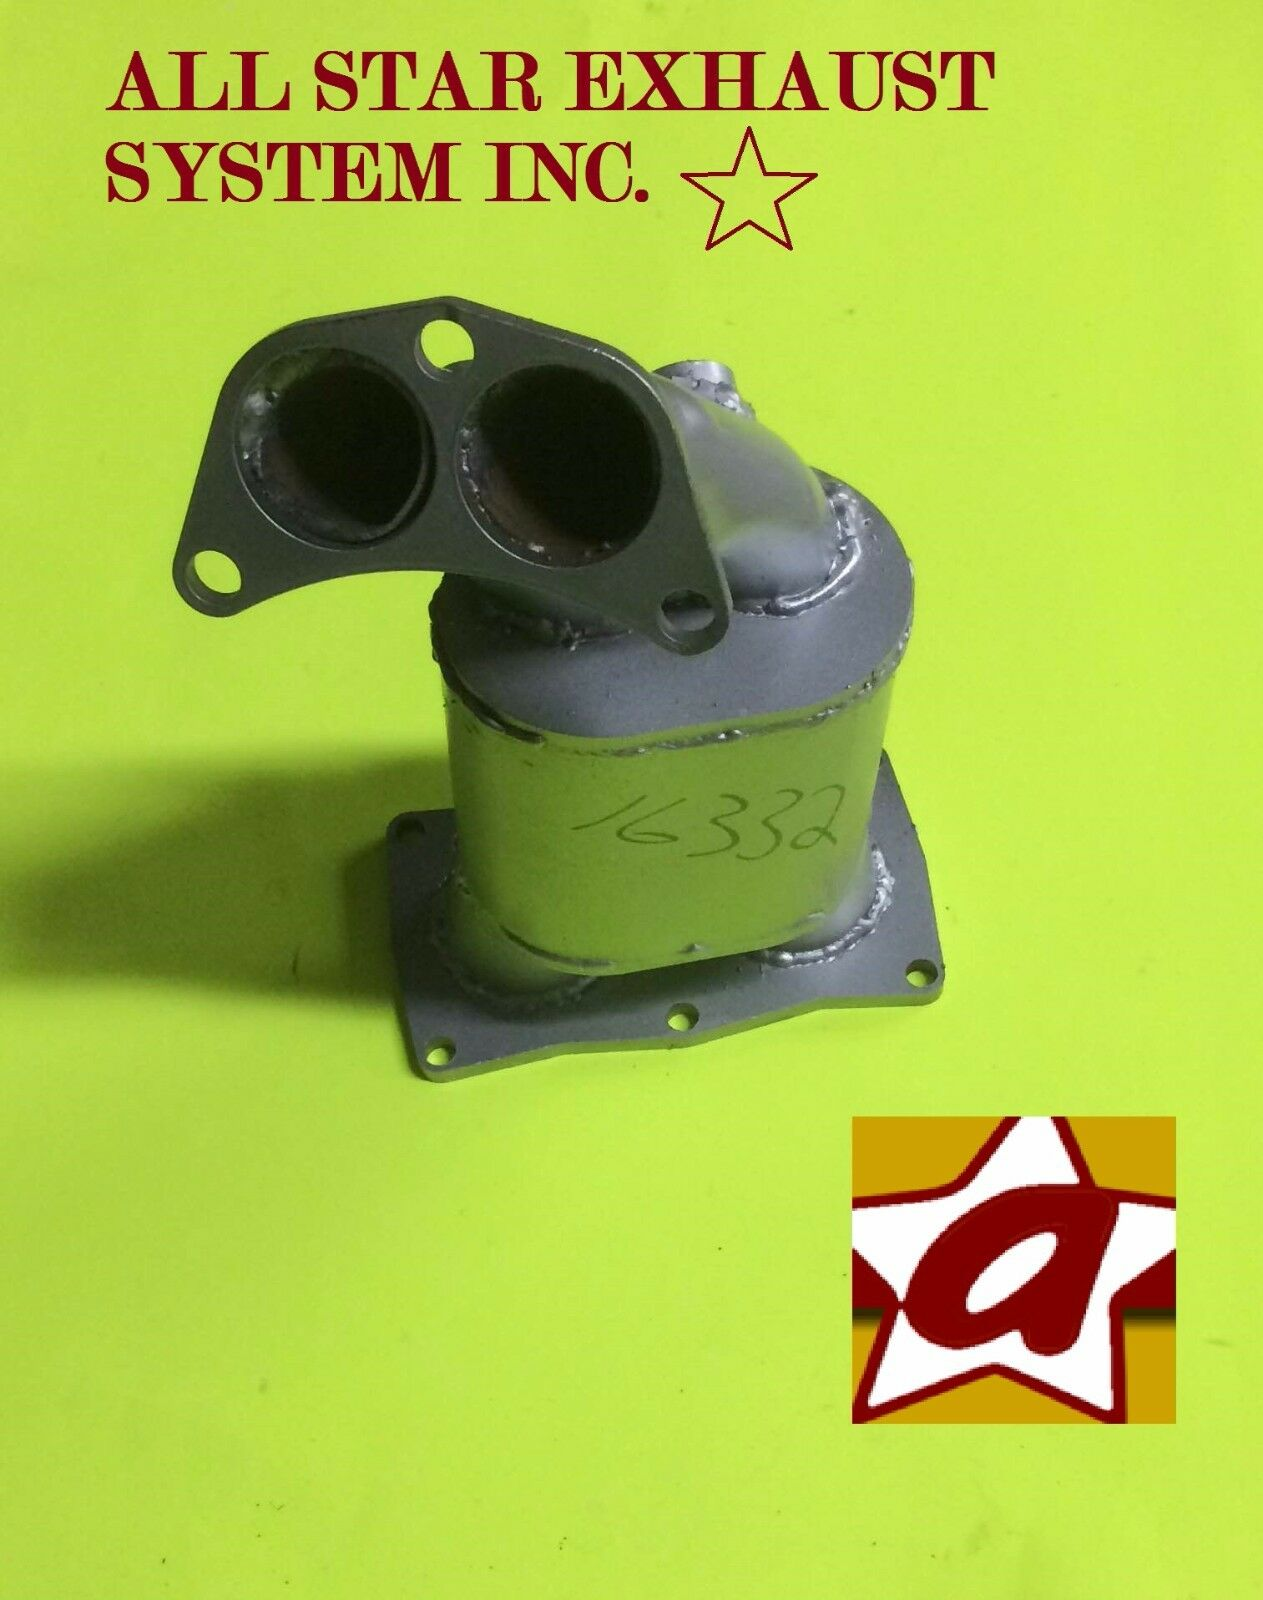 Manifold Converter Fits /> Nissan Sentra 1.8 L 2000-2001-2002  Direct fit 16332